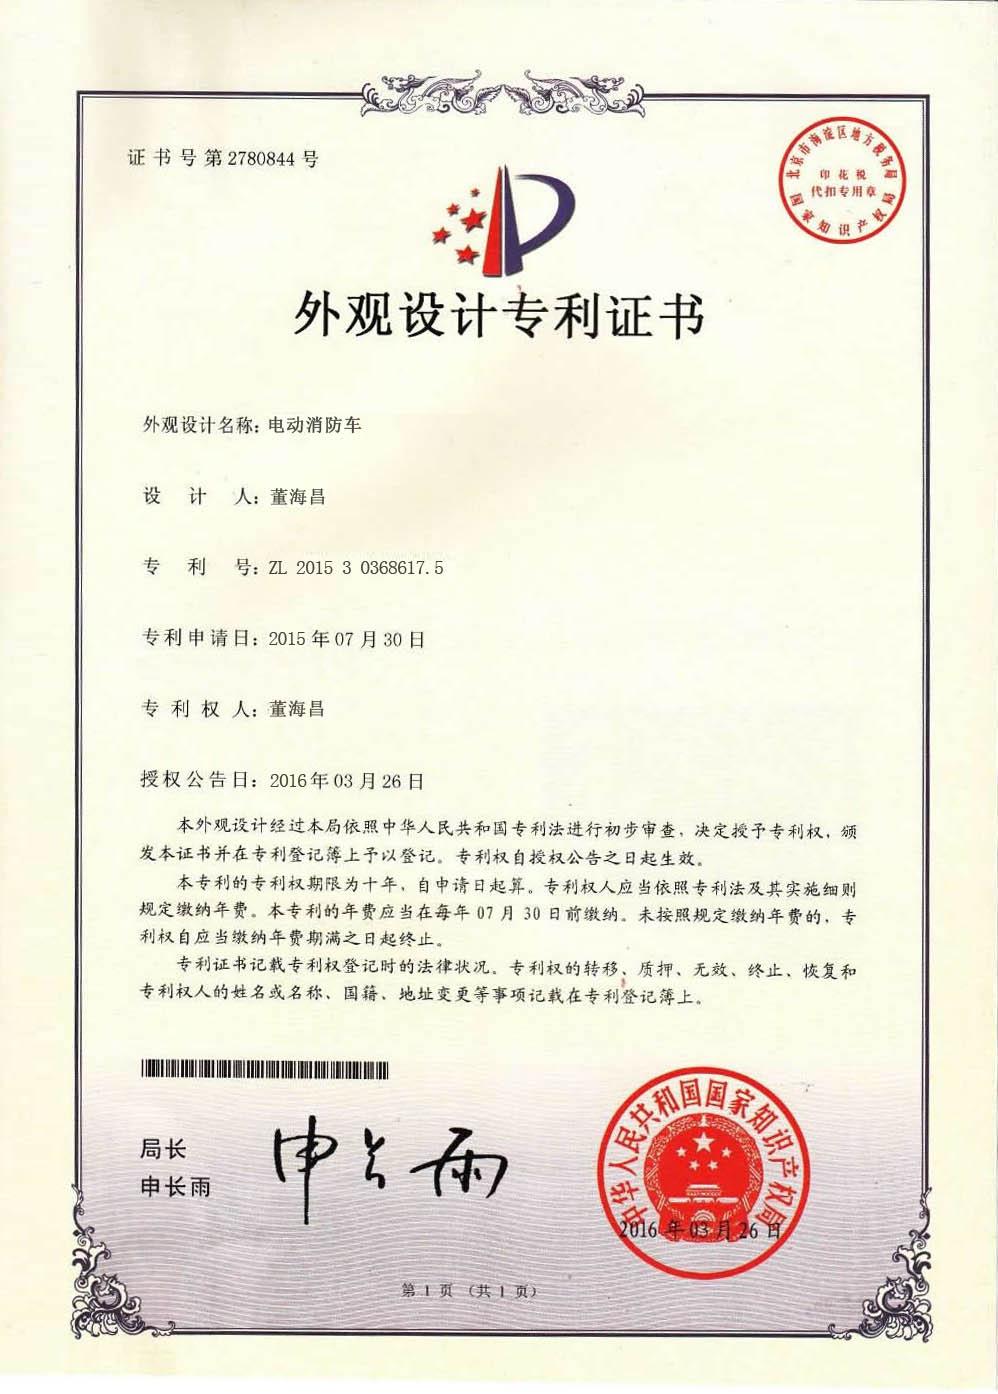 Design patent certificate